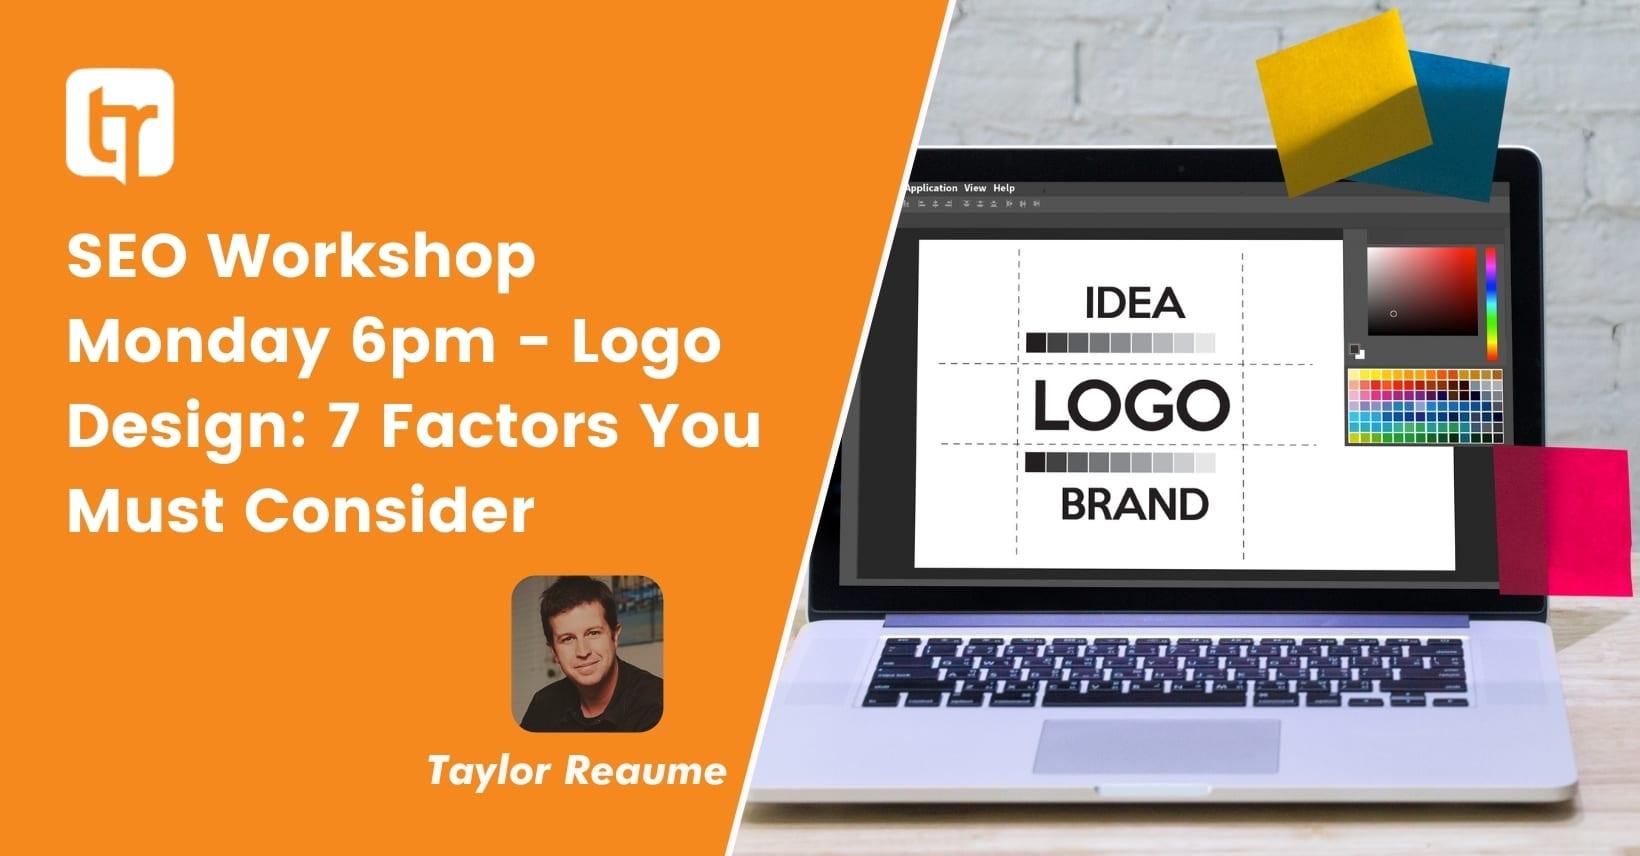 SEO Workshop Monday 6pm – Logo Design: 7 Factors You Must Consider